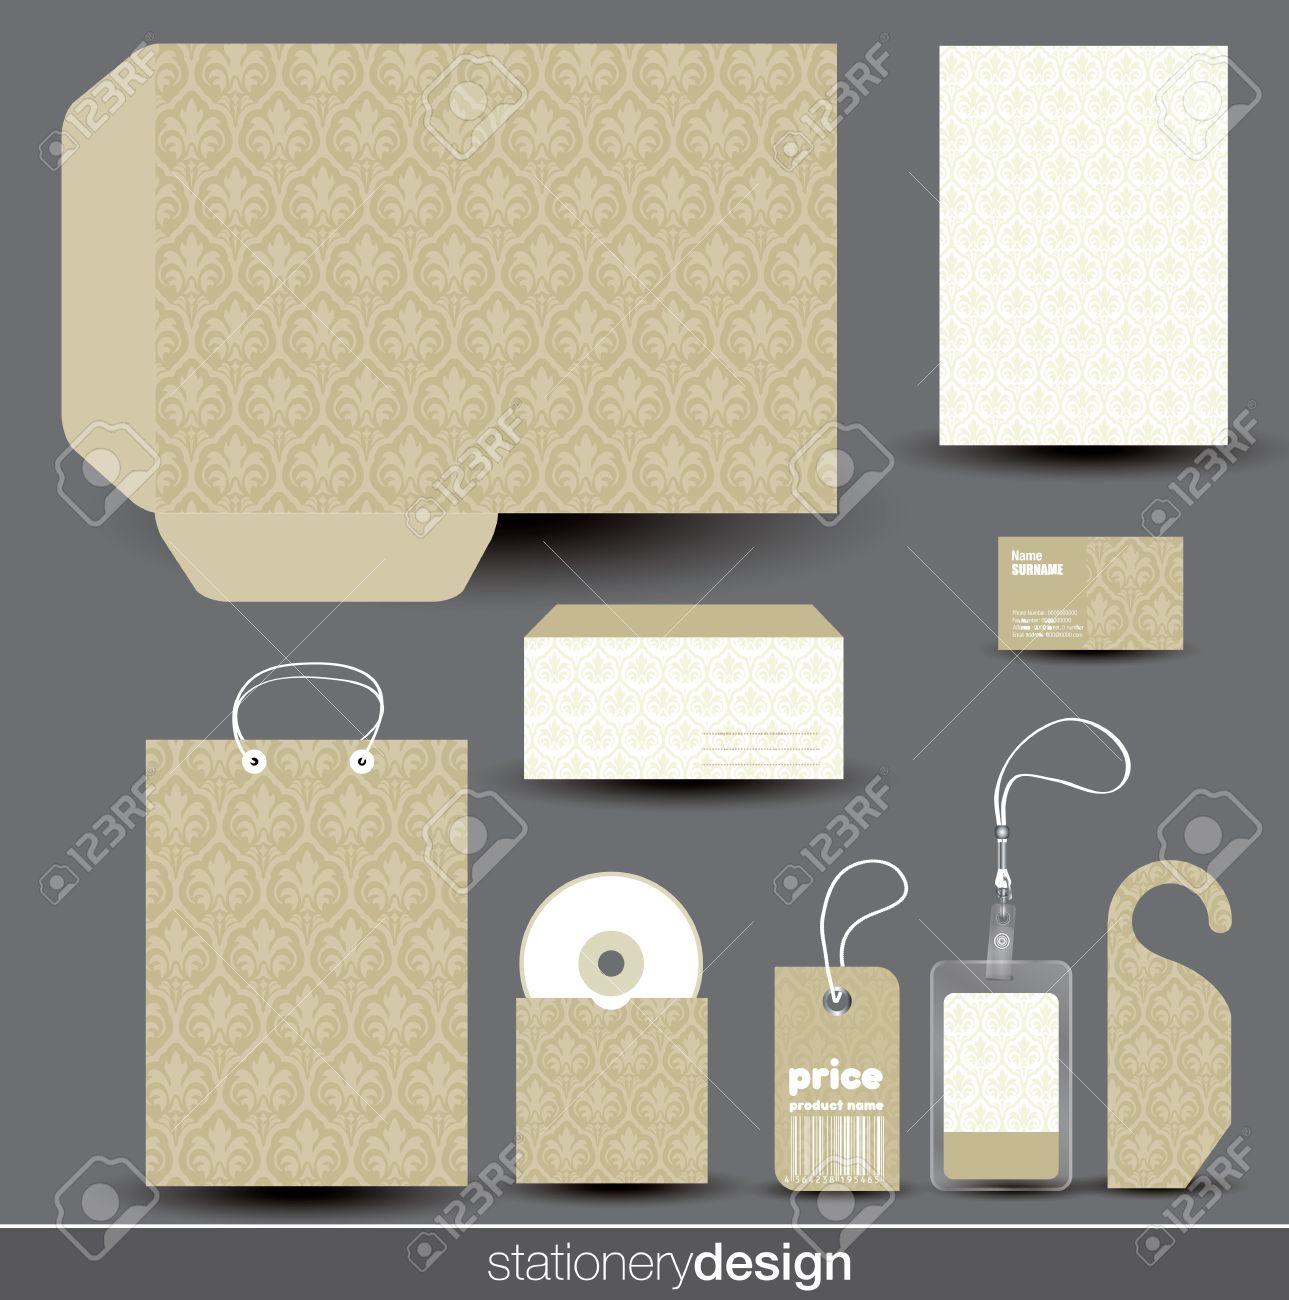 Stationery design set in editable vector format - 20948859